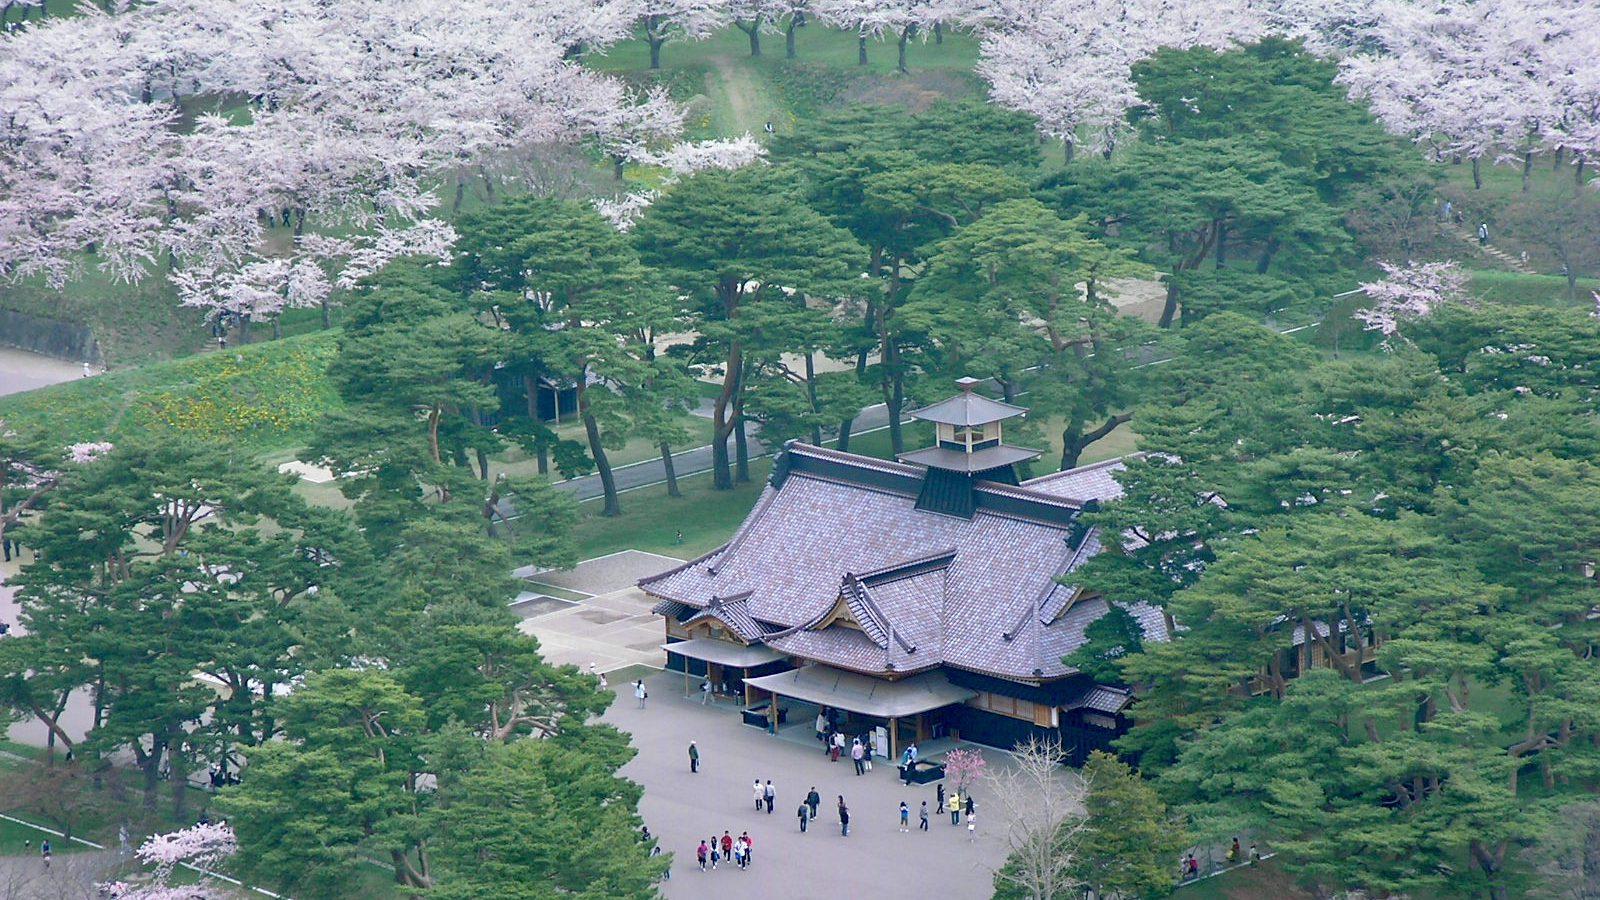 Hakodate Goryokaku Park